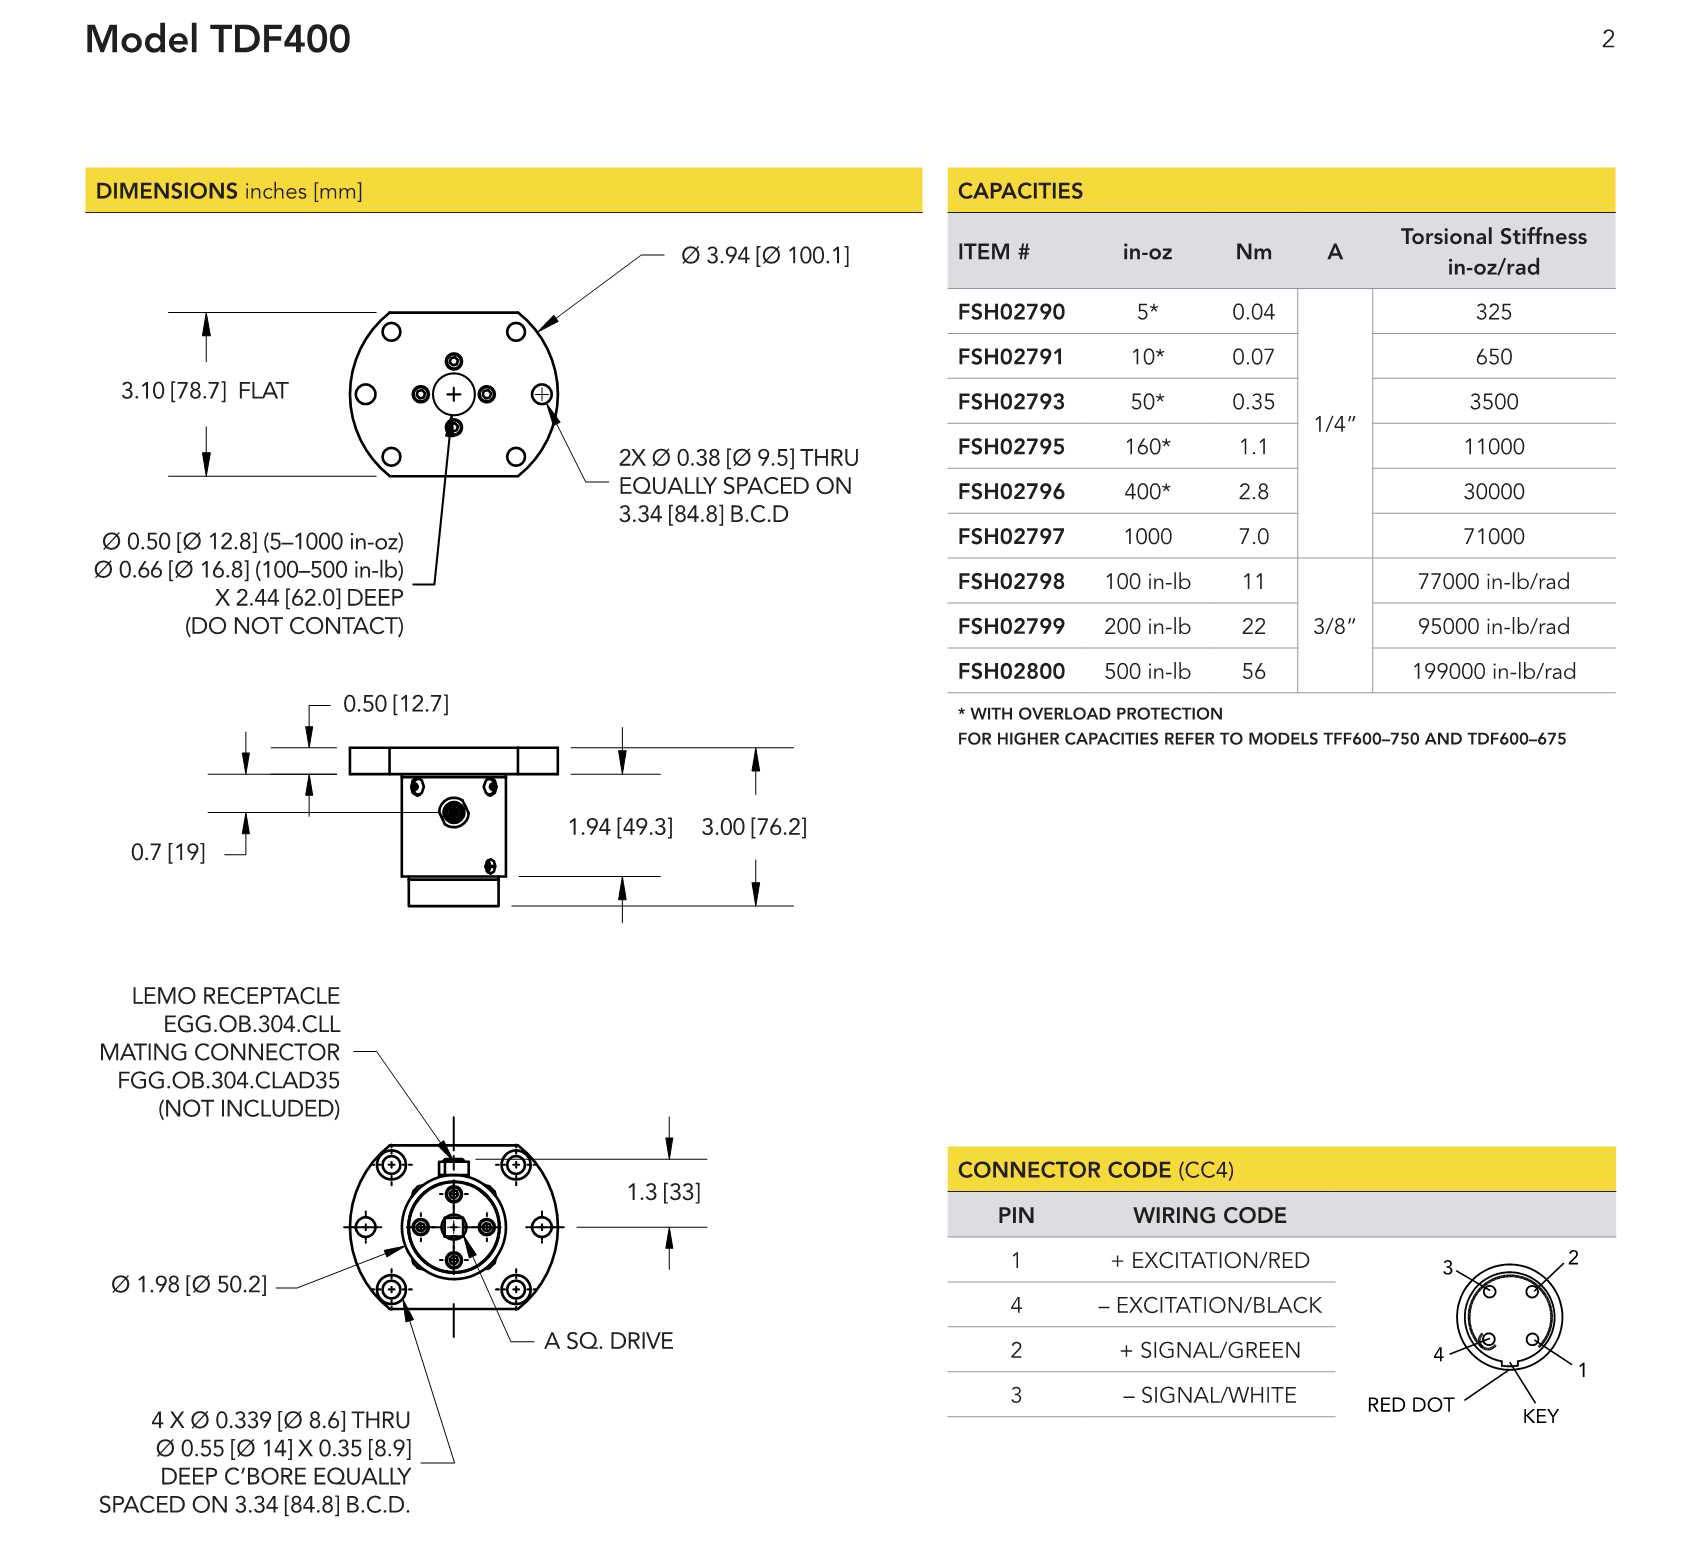 TDF400法兰型静态扭矩传感器小量程高精度传感器_美国Futek